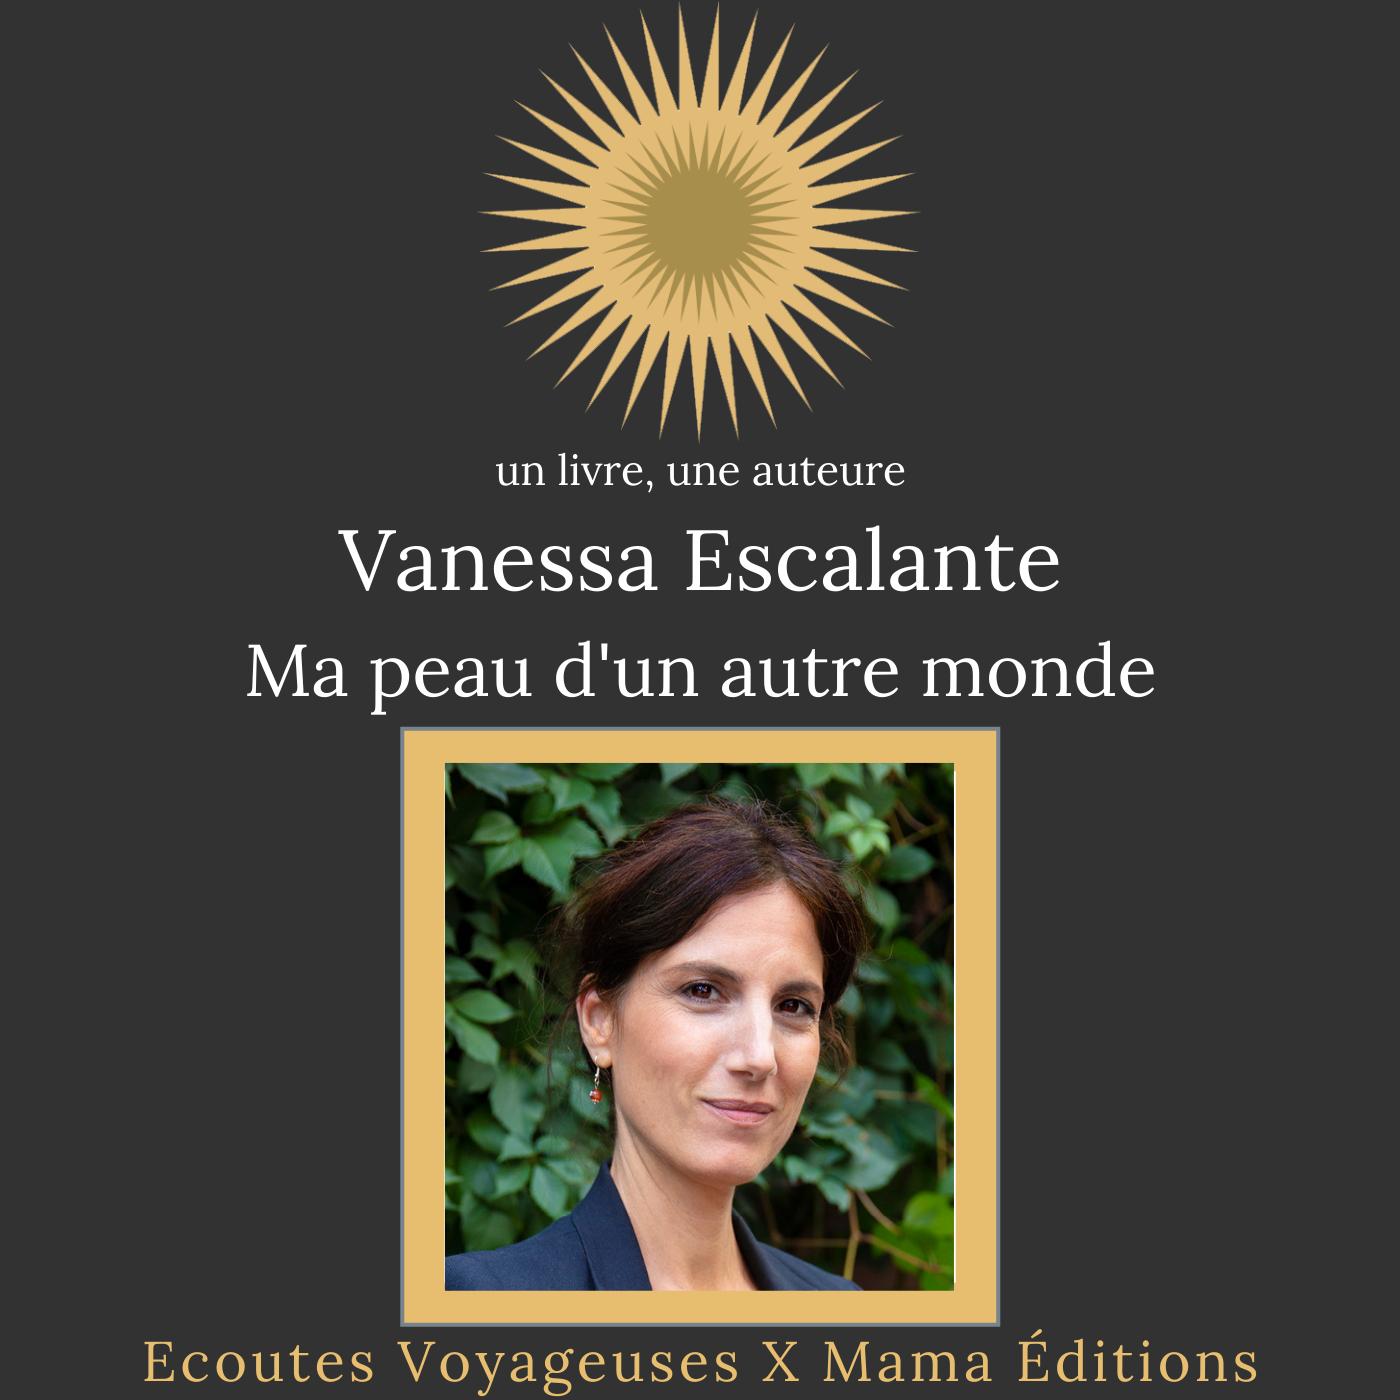 Vanessa Escalante, ma peau d'un autre monde